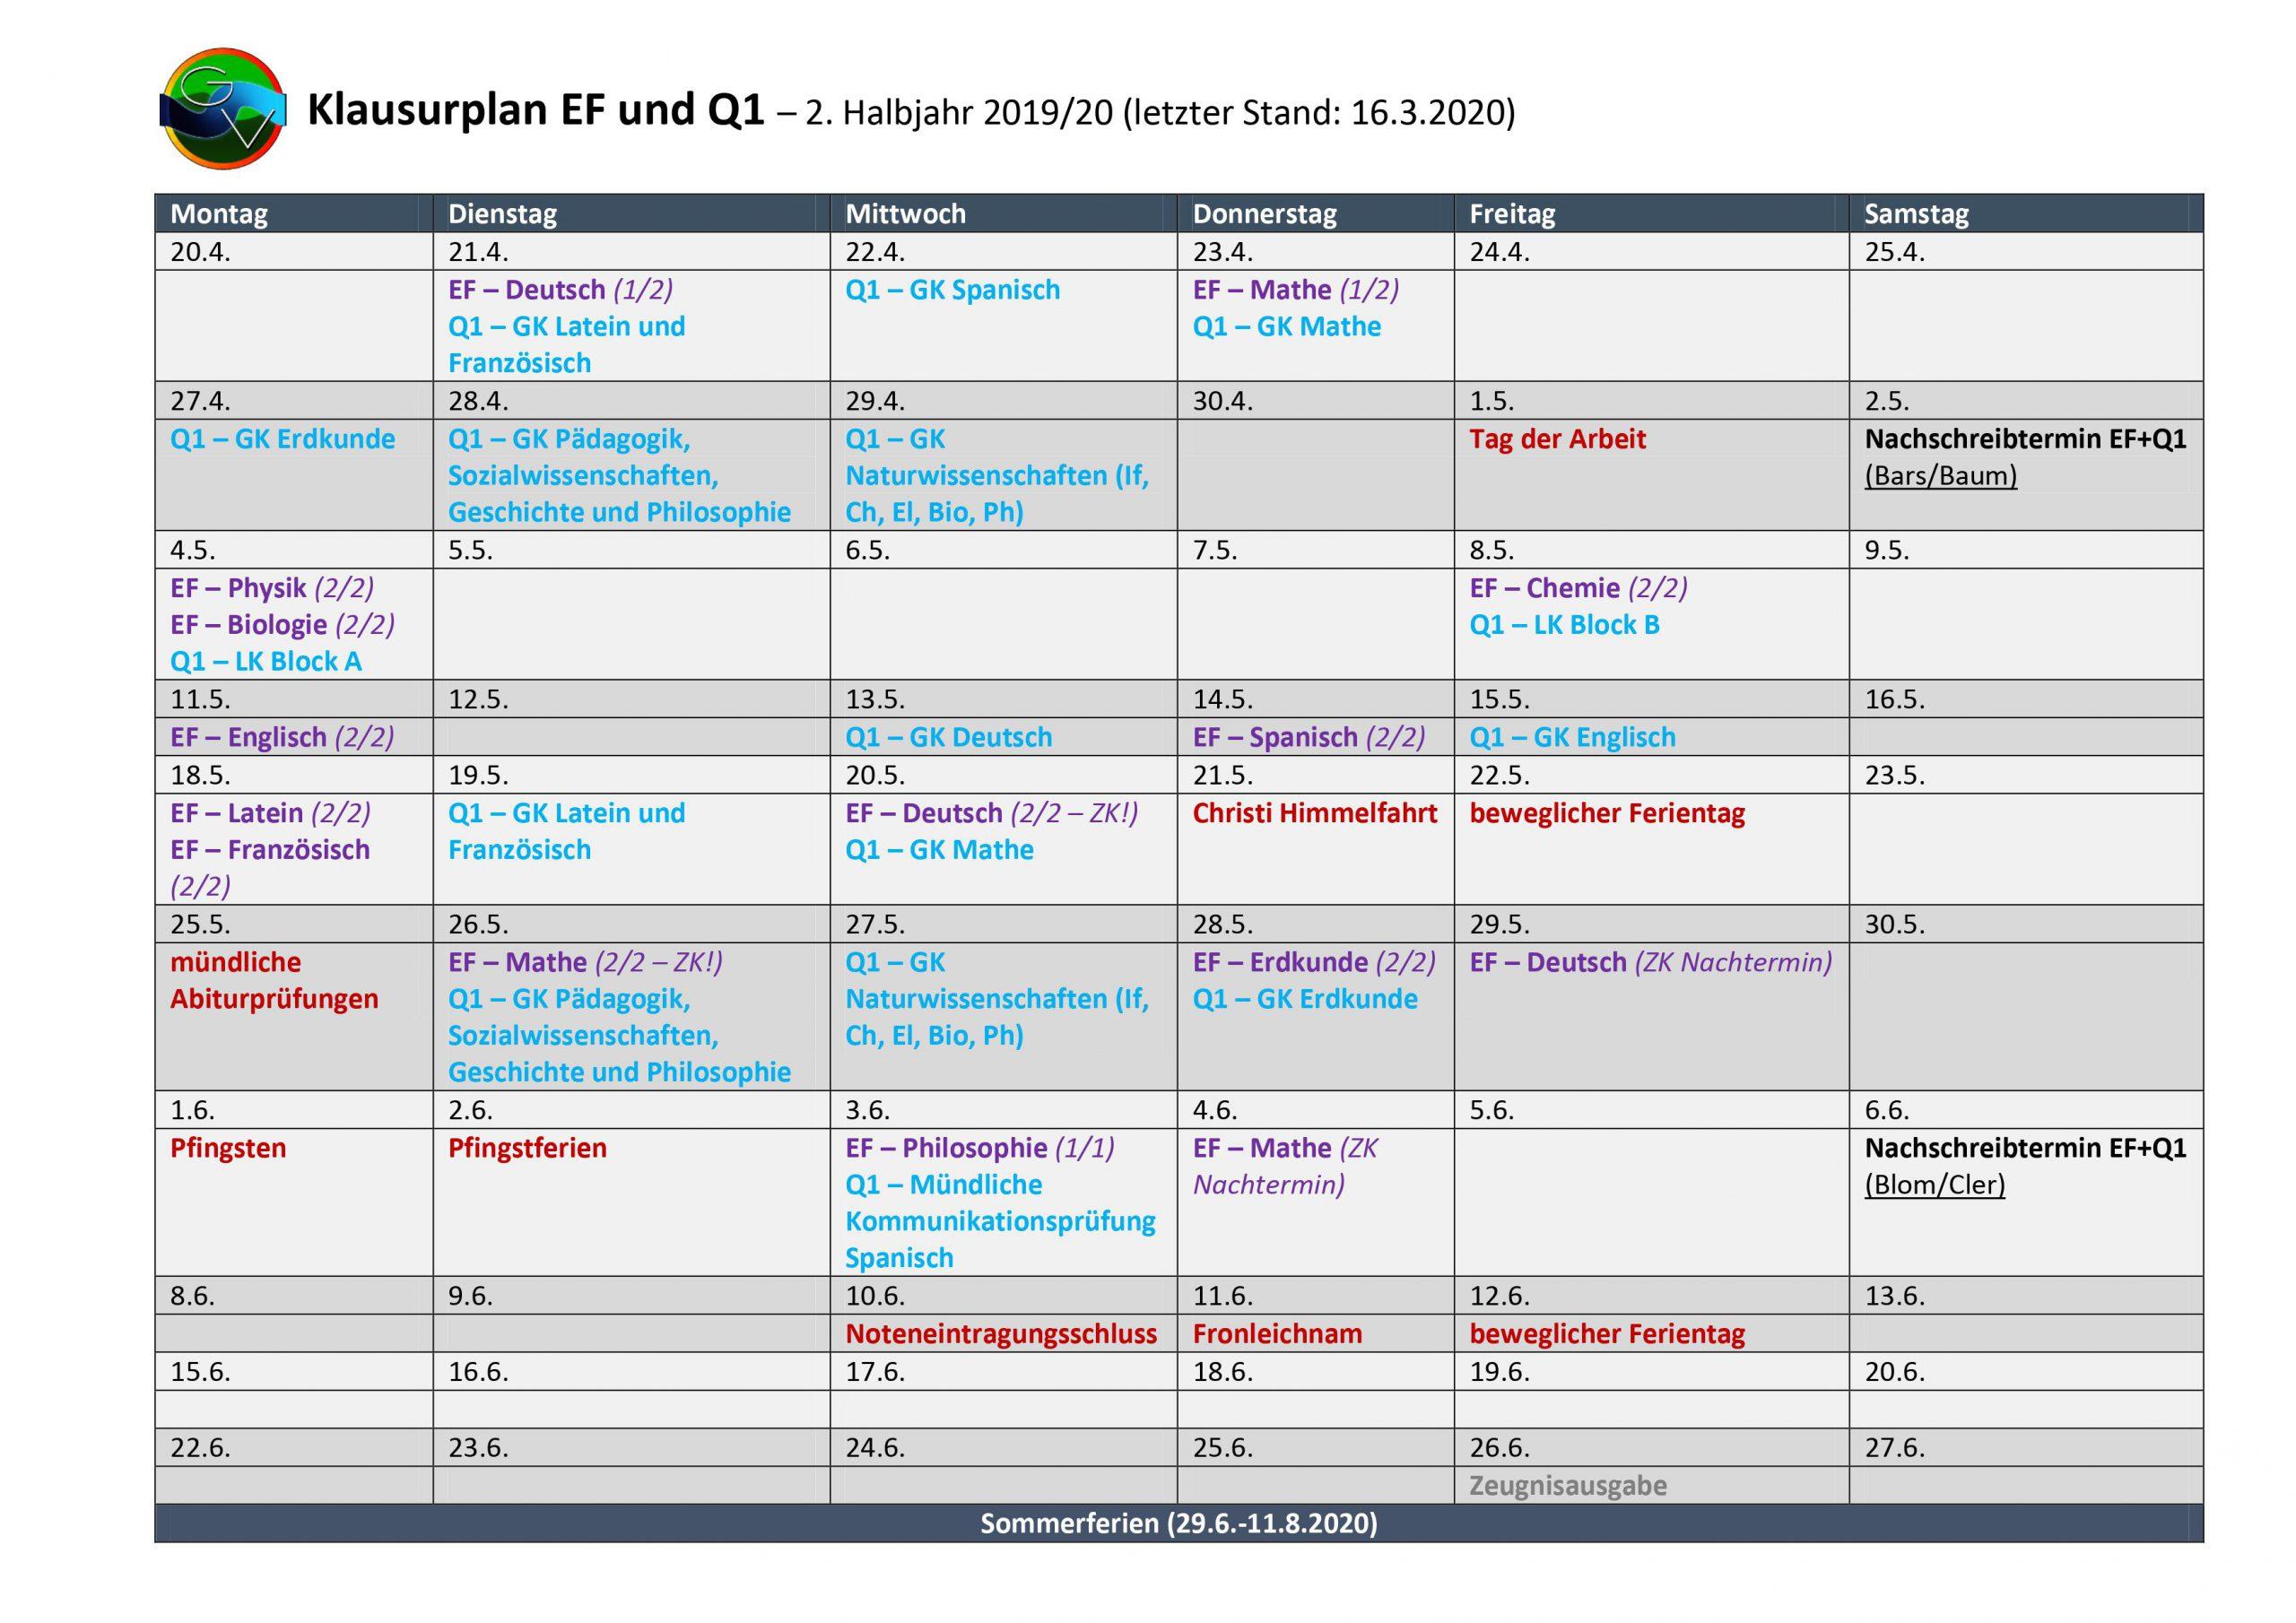 2020-03-16_Klausurplan-EF-Q1-2HJ_2